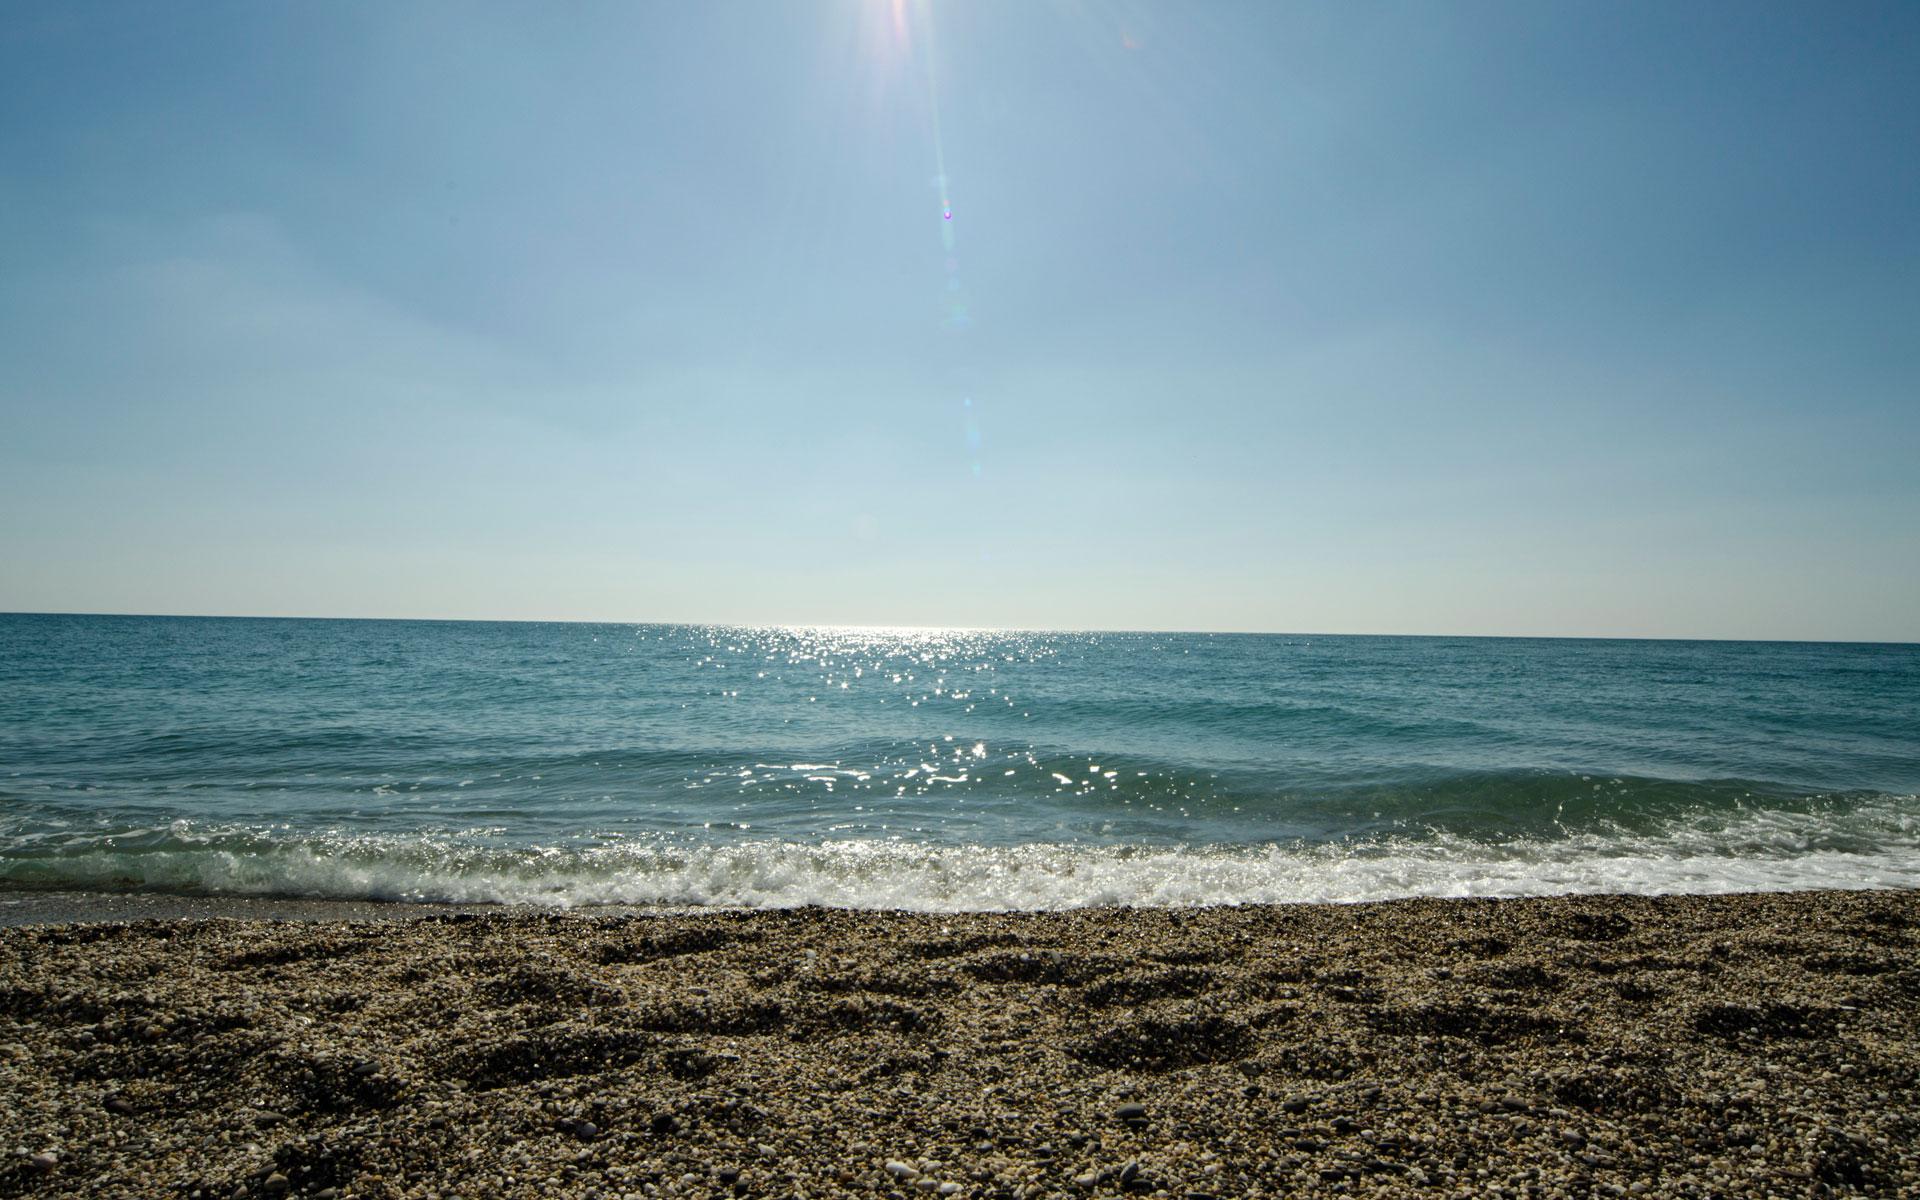 Море в апреле 2019. Фото Евпатории